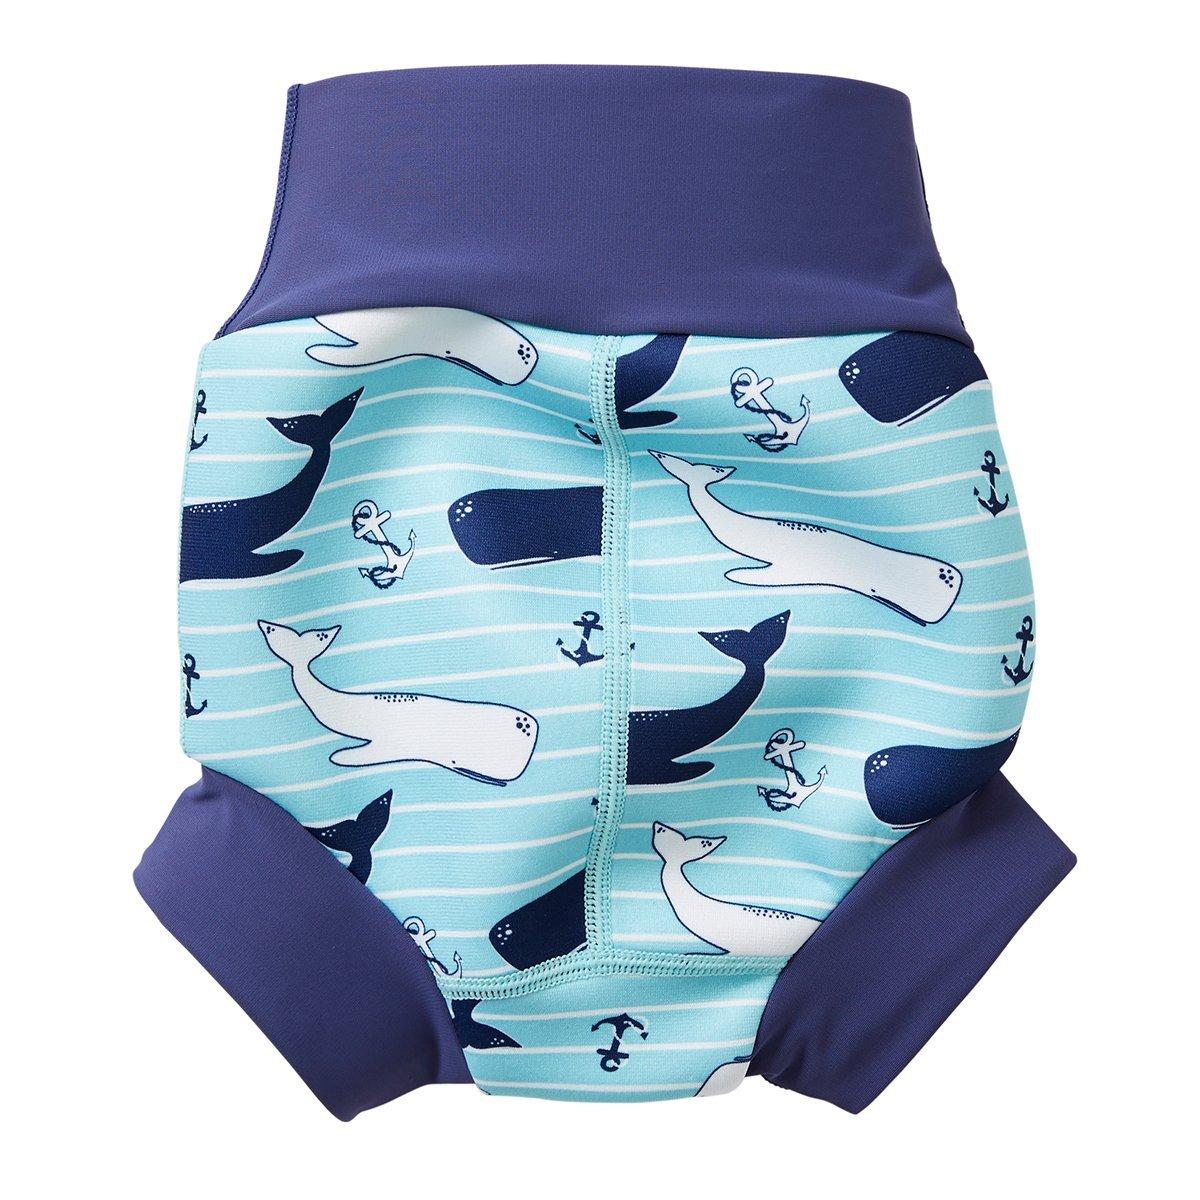 Splash-About-Happy-Nappy-Baby-amp-Toddler-Swimwear-Nappy-and-Shorts-Sun-Safe thumbnail 39